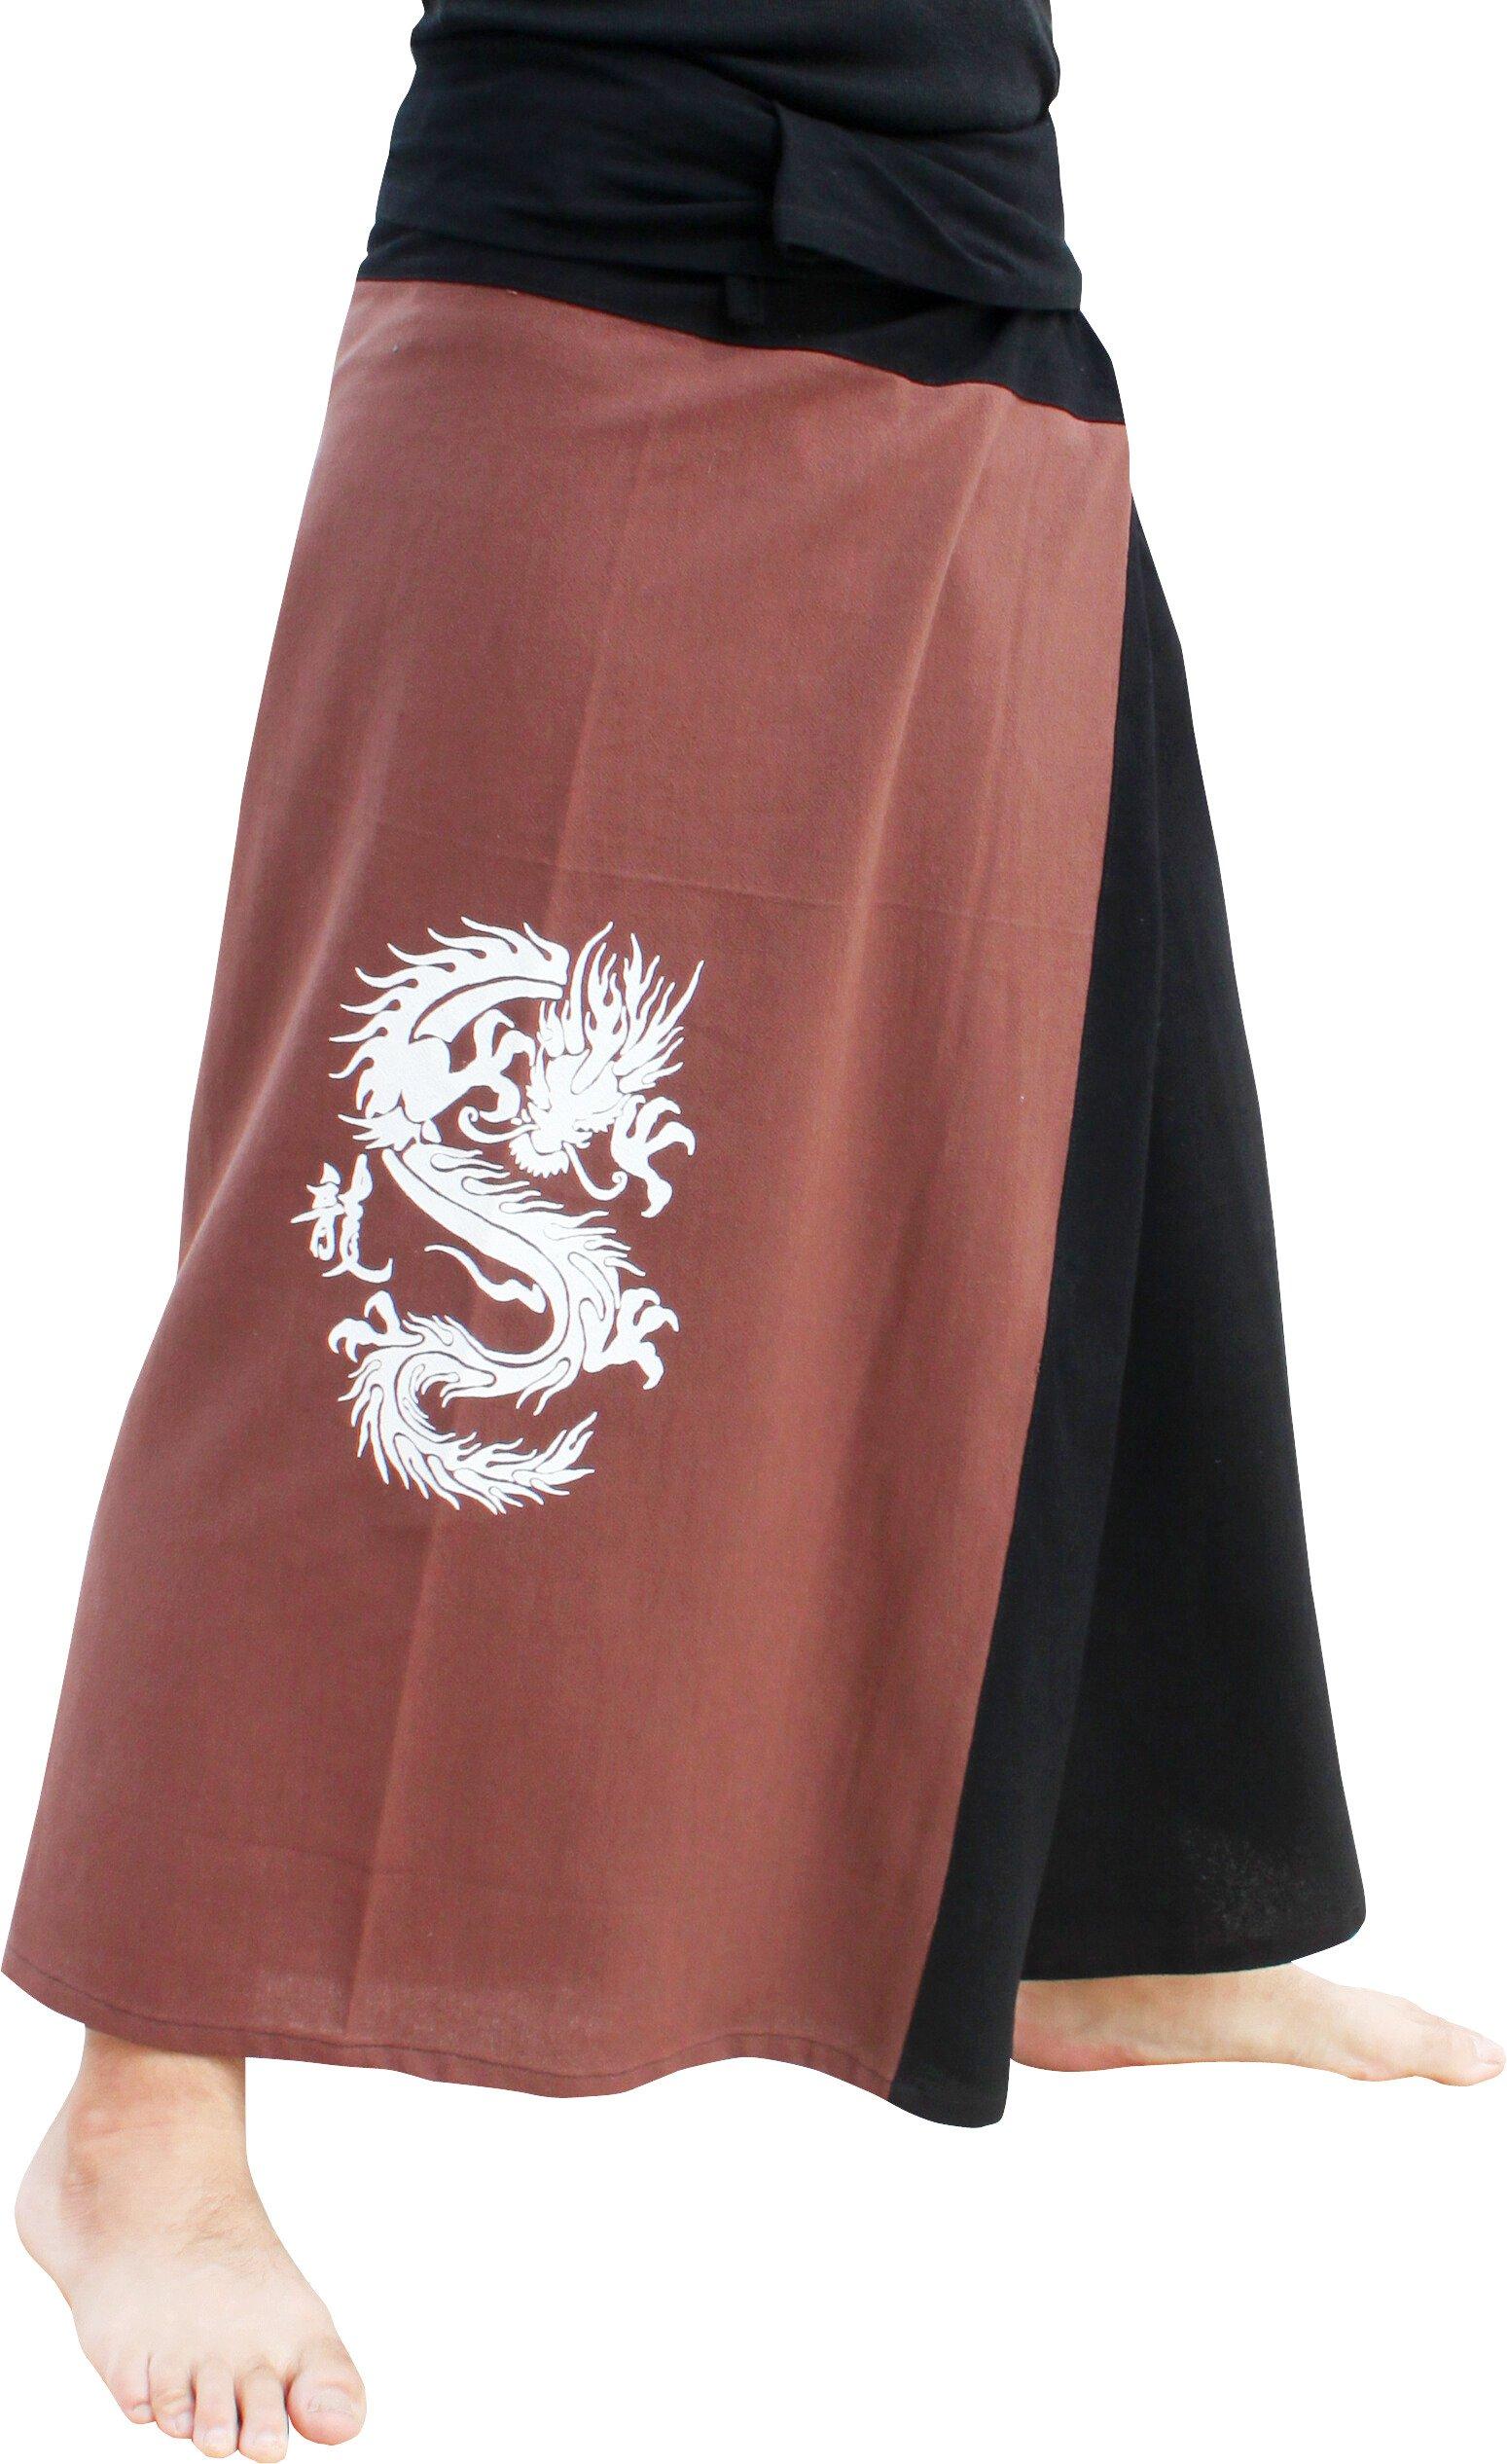 Raan Pah Muang RaanPahMuang Thick Cotton Two Color Fire Dragon Samurai Wrap Pants, Medium, Dark Brown & Black by Raan Pah Muang